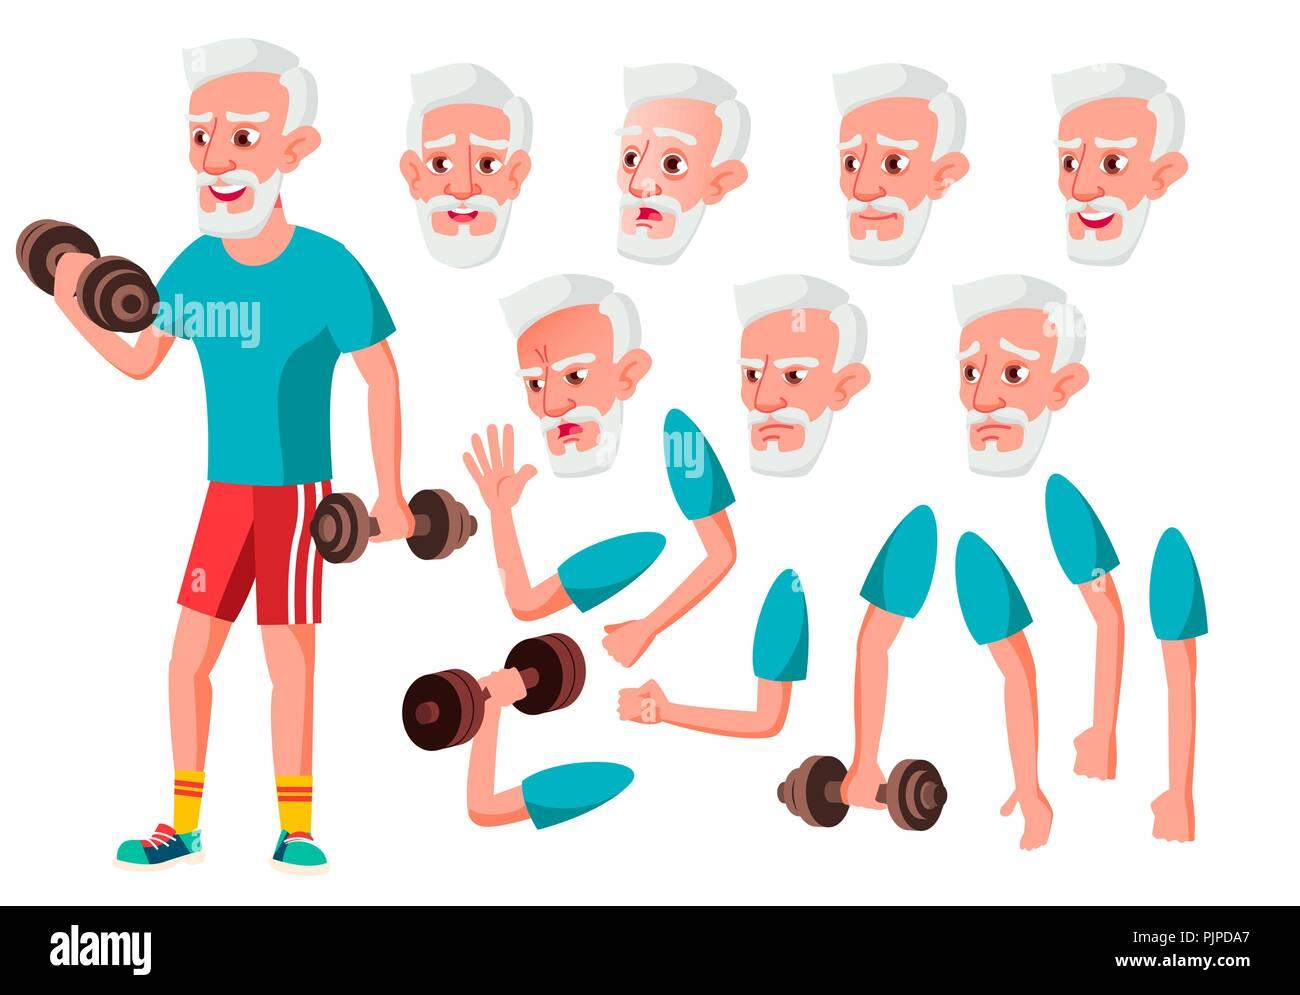 Alter Mann Vektor Altere Person Alter Altere Menschen Niedlich